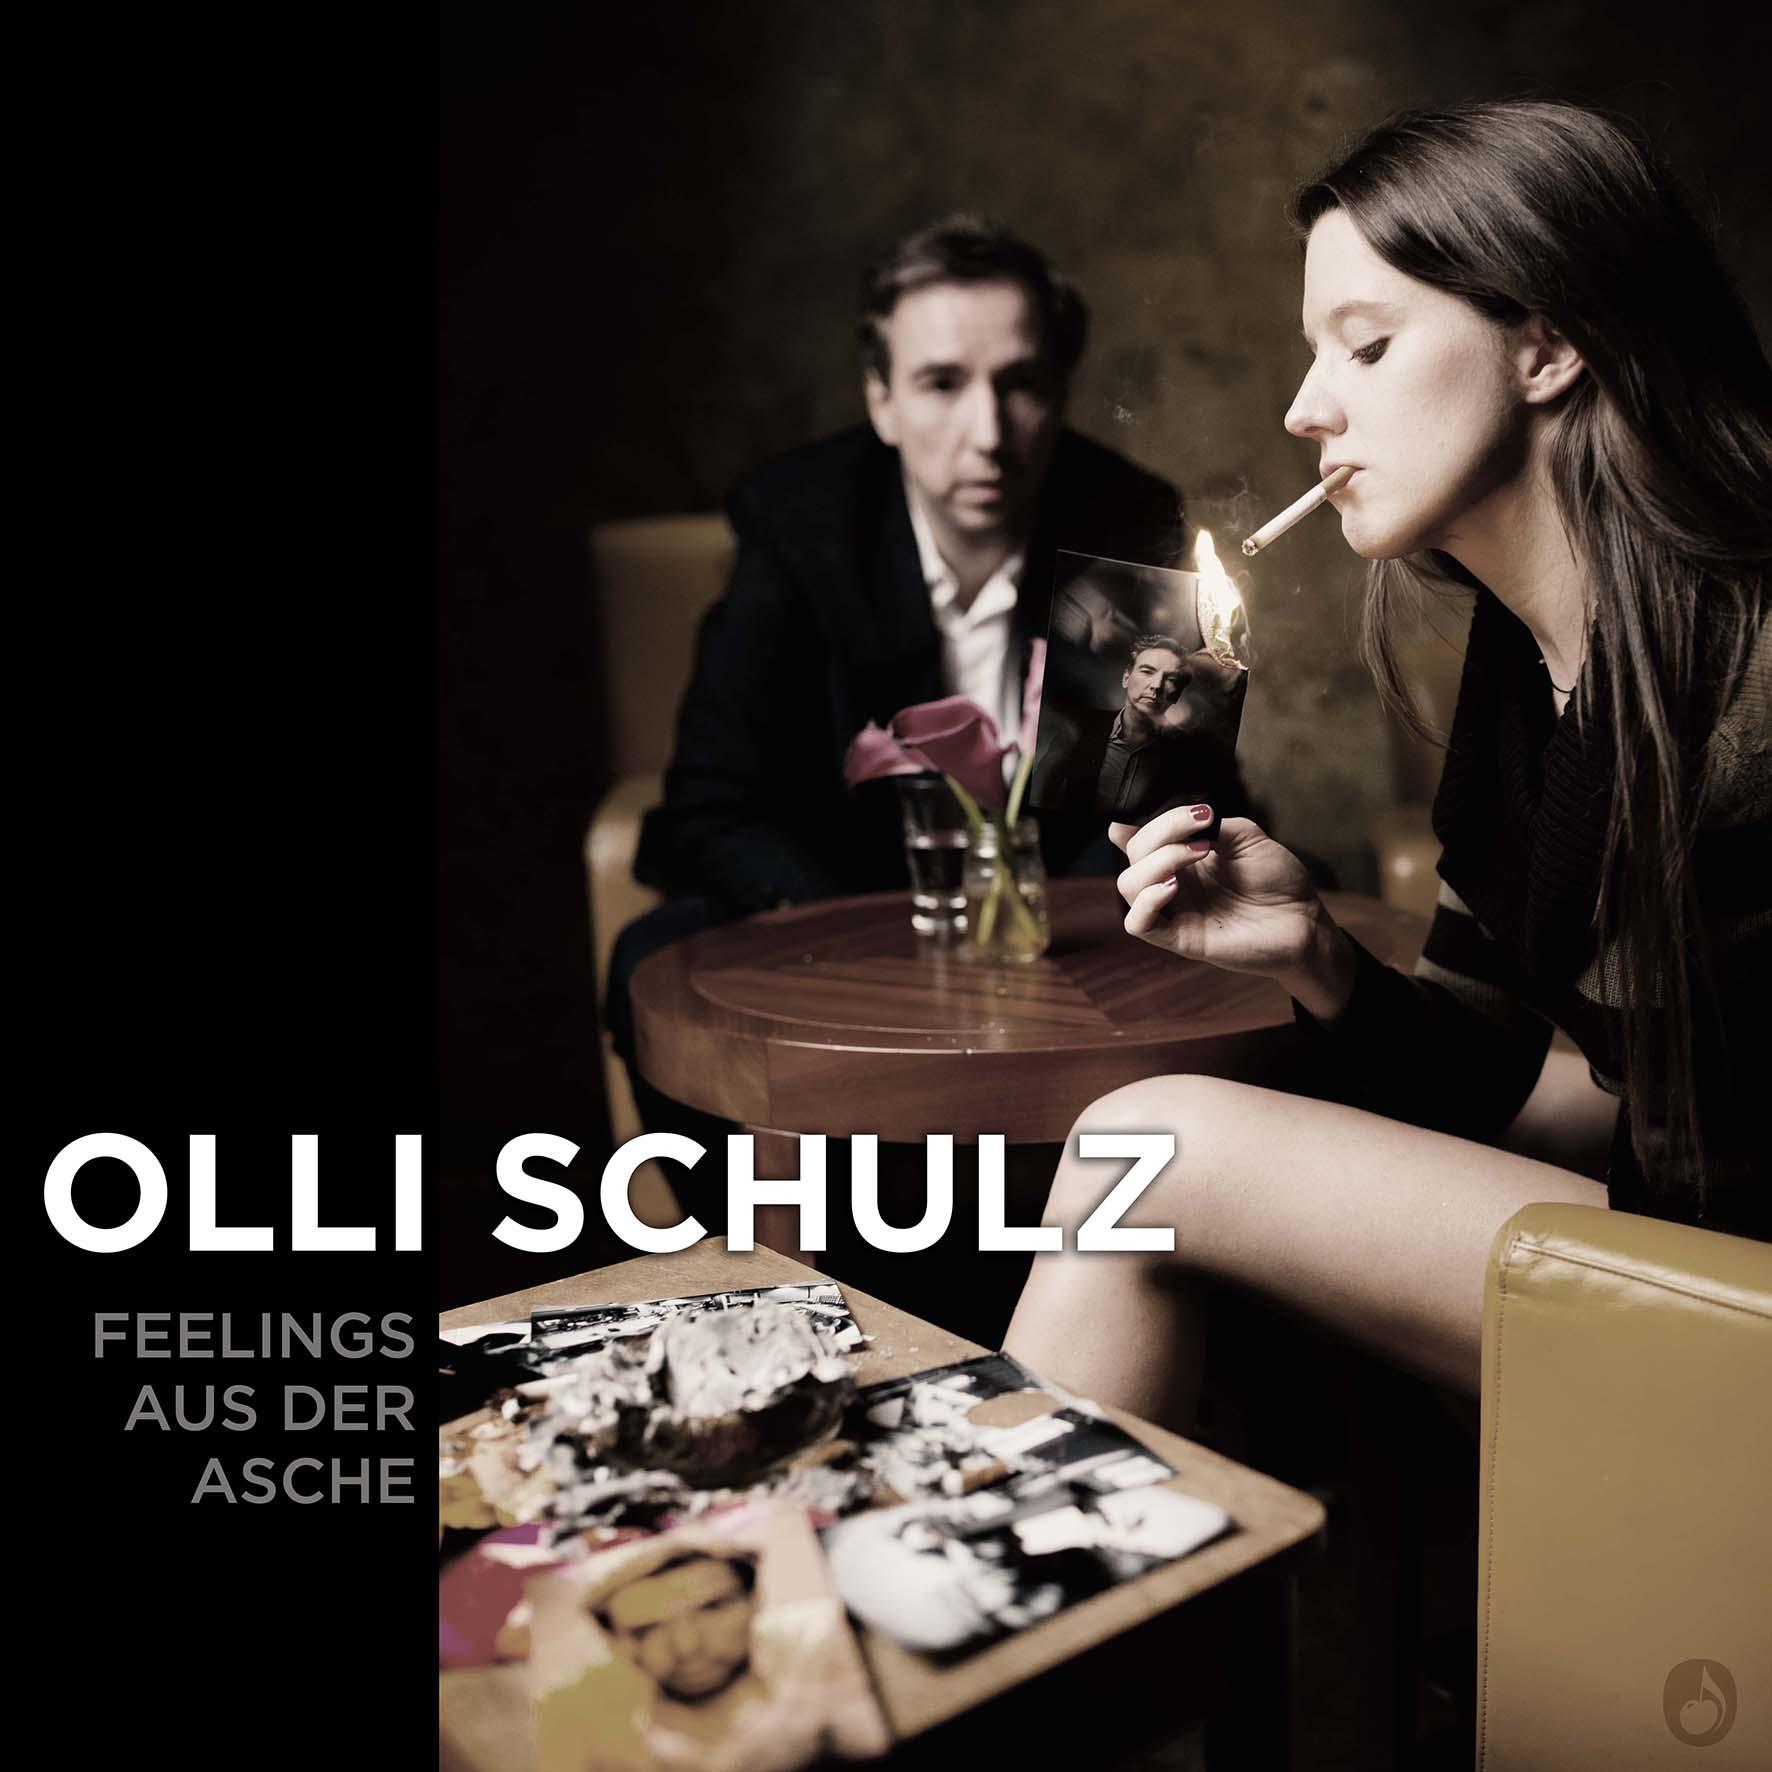 OLLI SCHULZ – Feelings Aus Der Asche